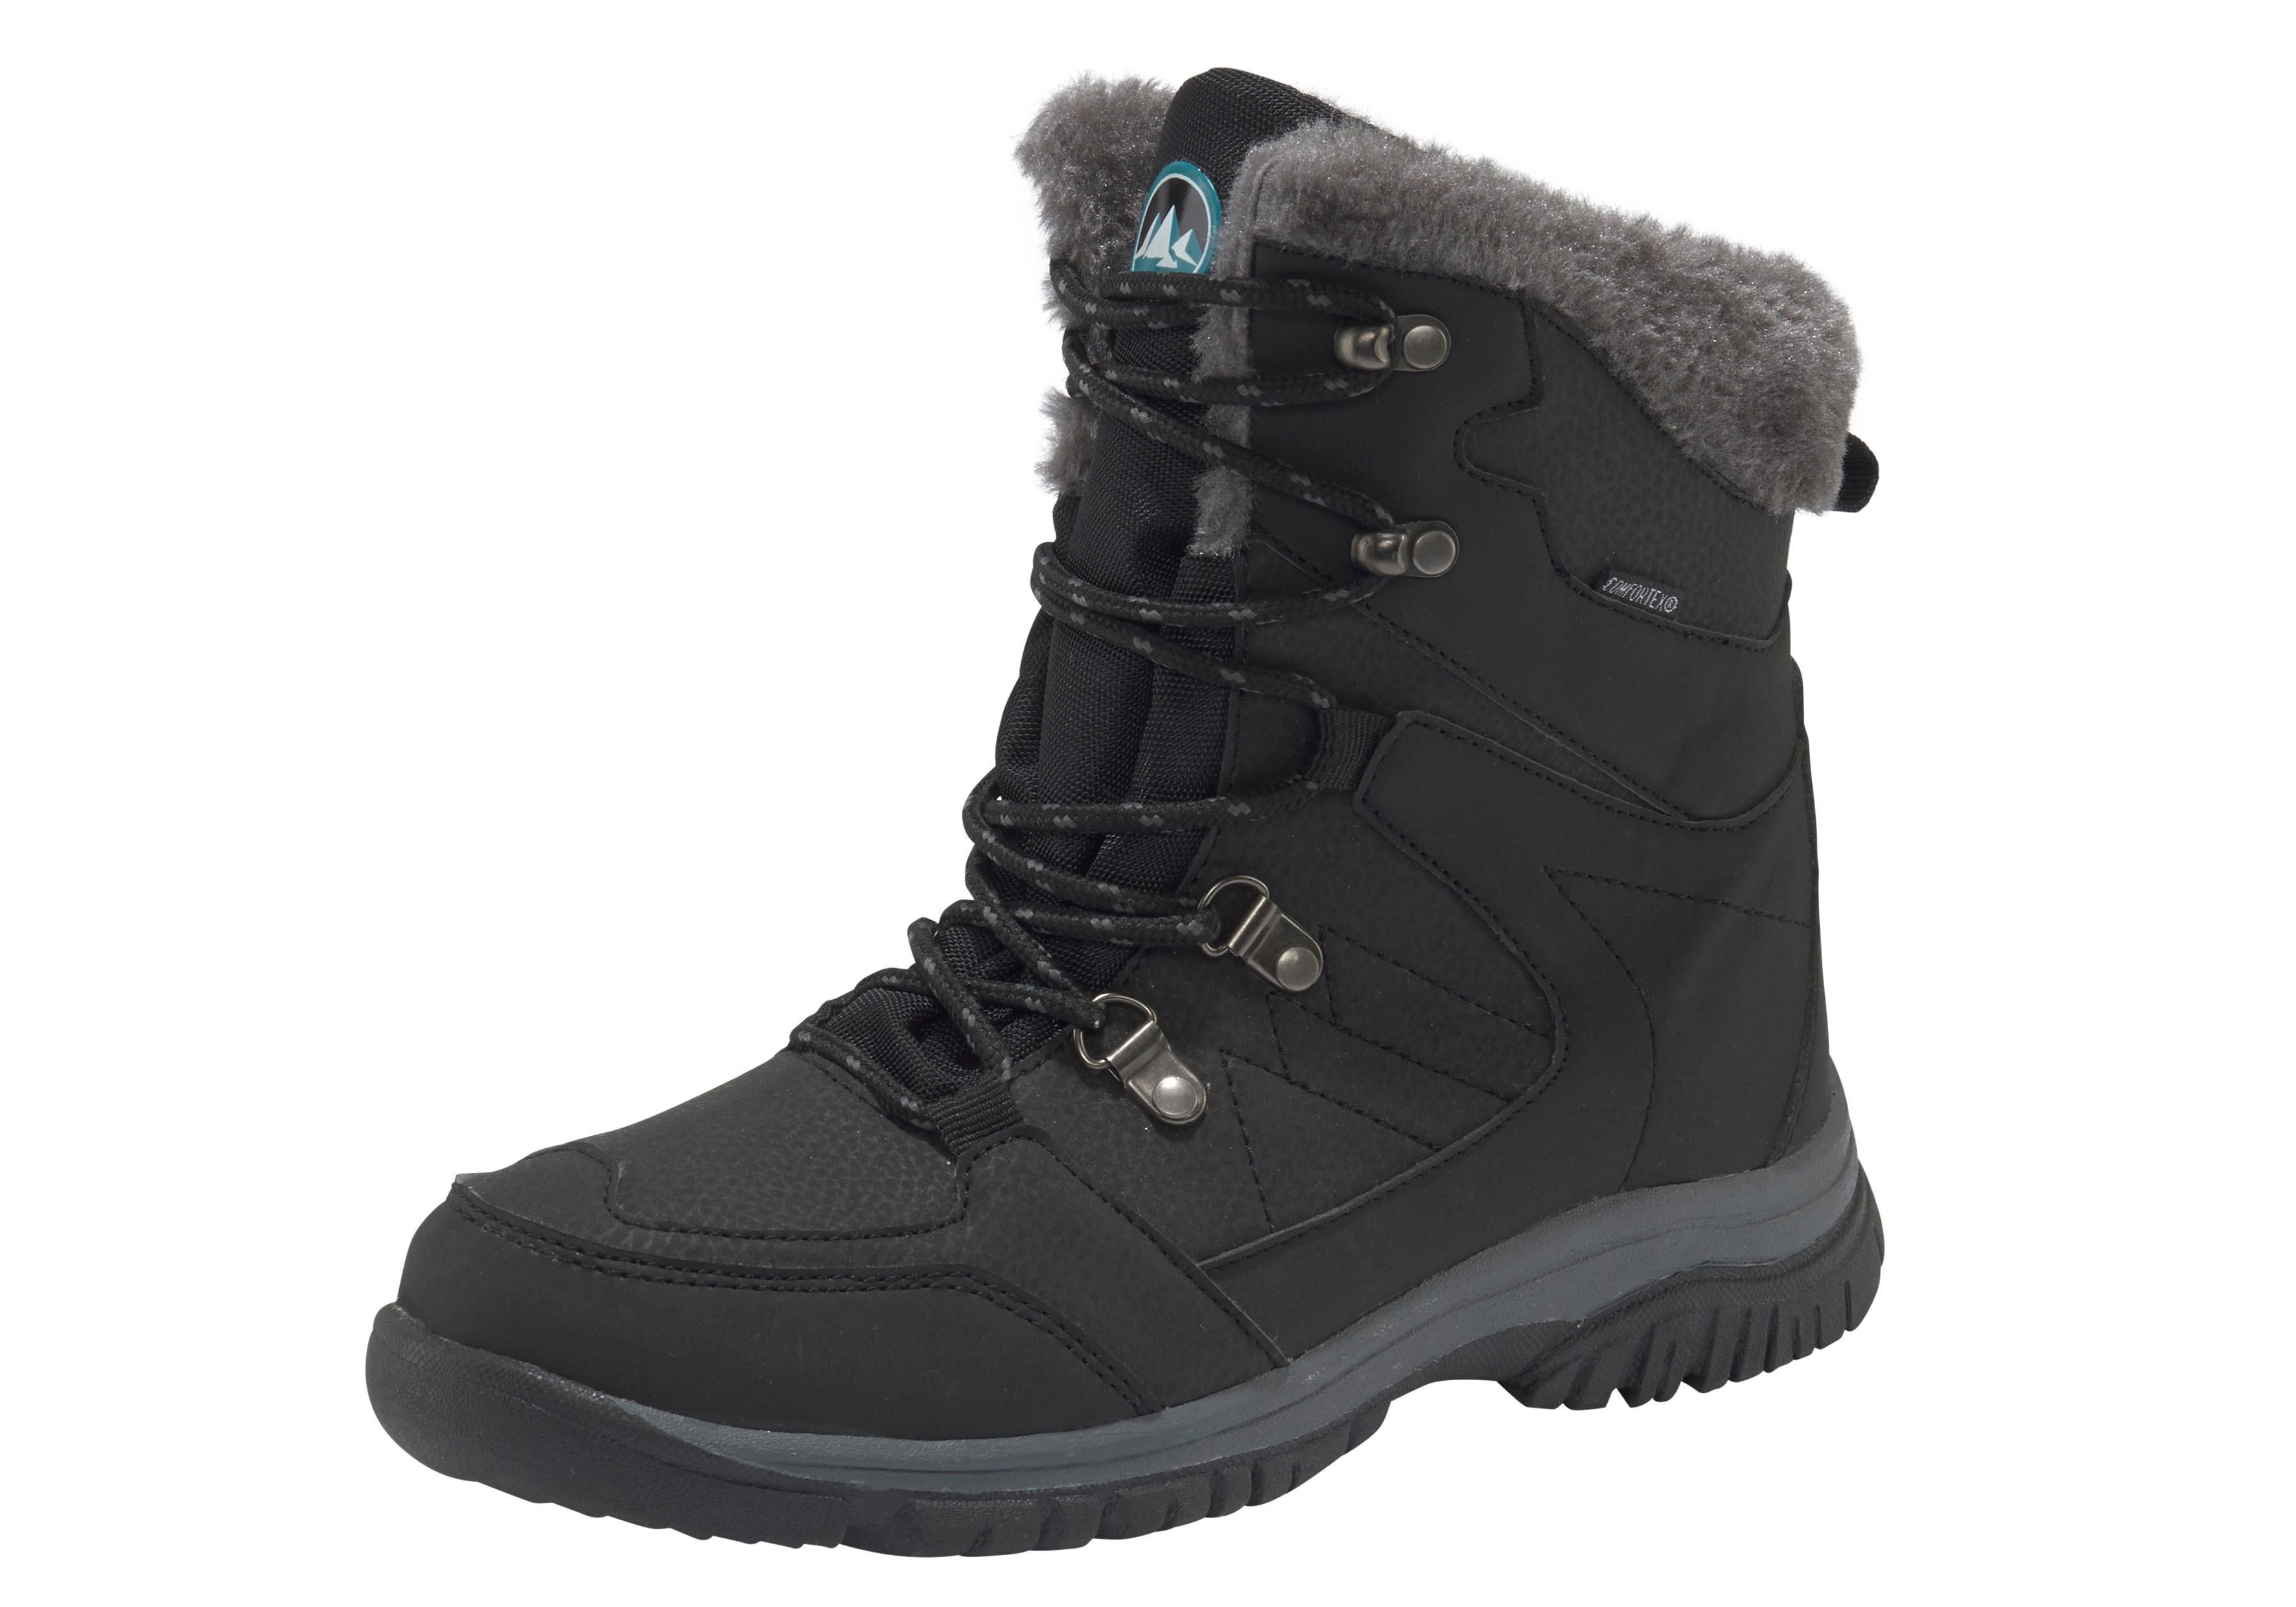 Polarino Outdoorwinterstiefel Ice Floe   Schuhe > Outdoorschuhe > Outdoorwinterstiefel   Schwarz   Polarino